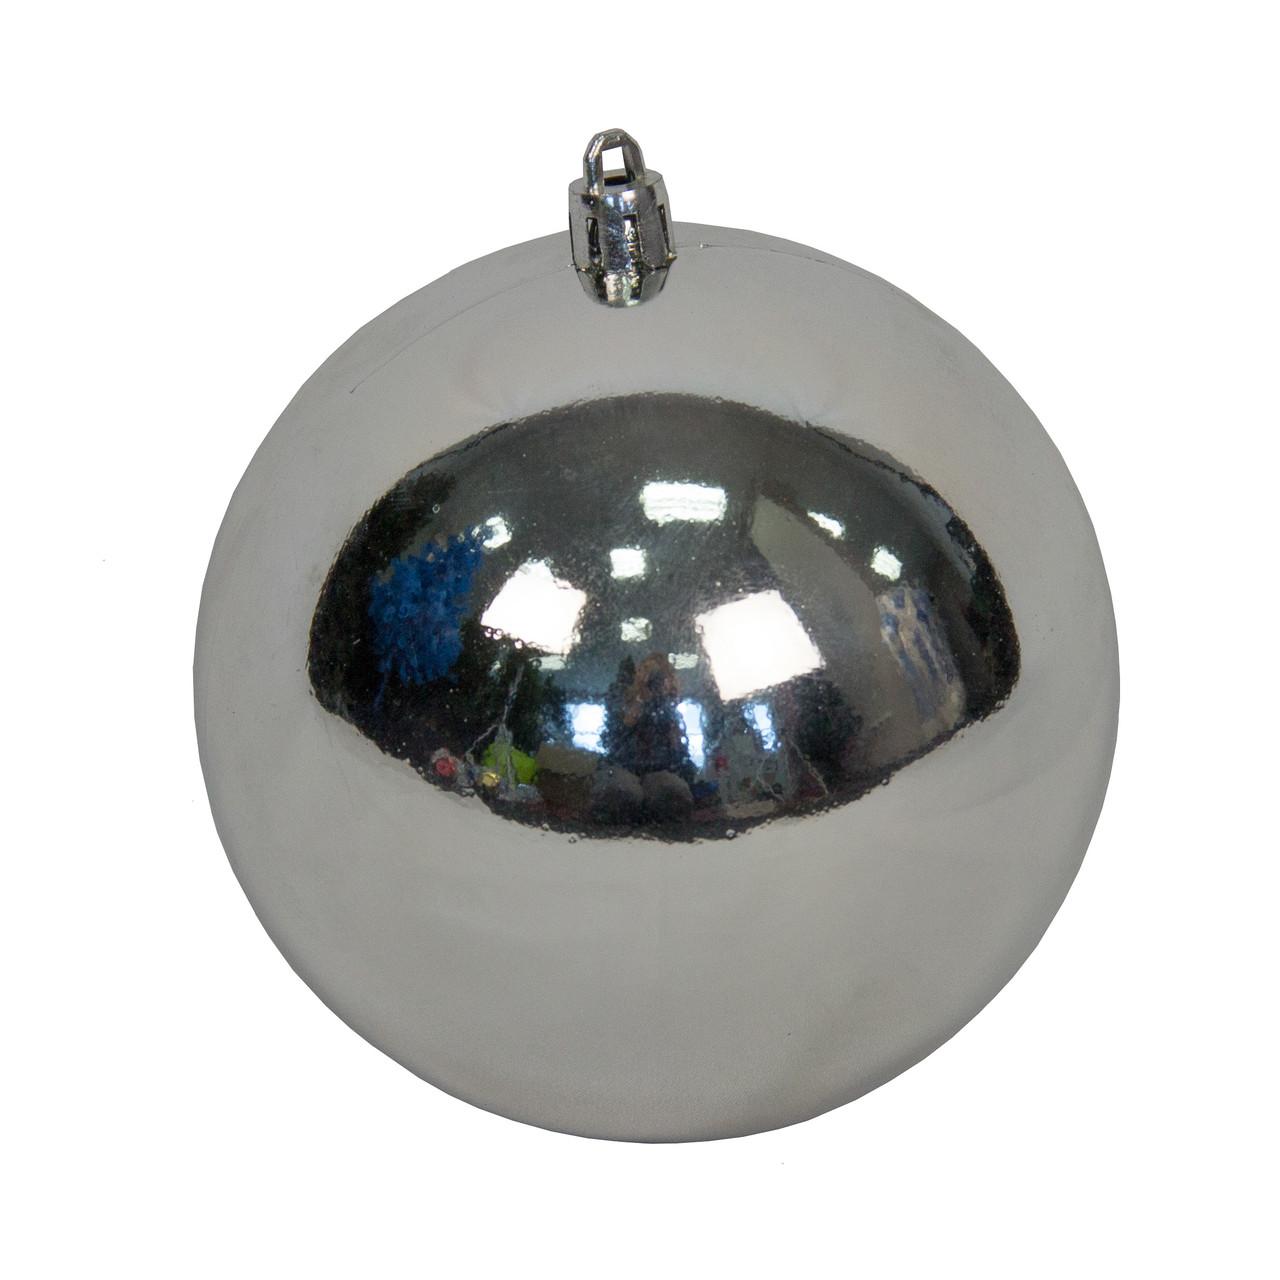 Шар пластиковый глянцевый d-10см, серебро (890254)